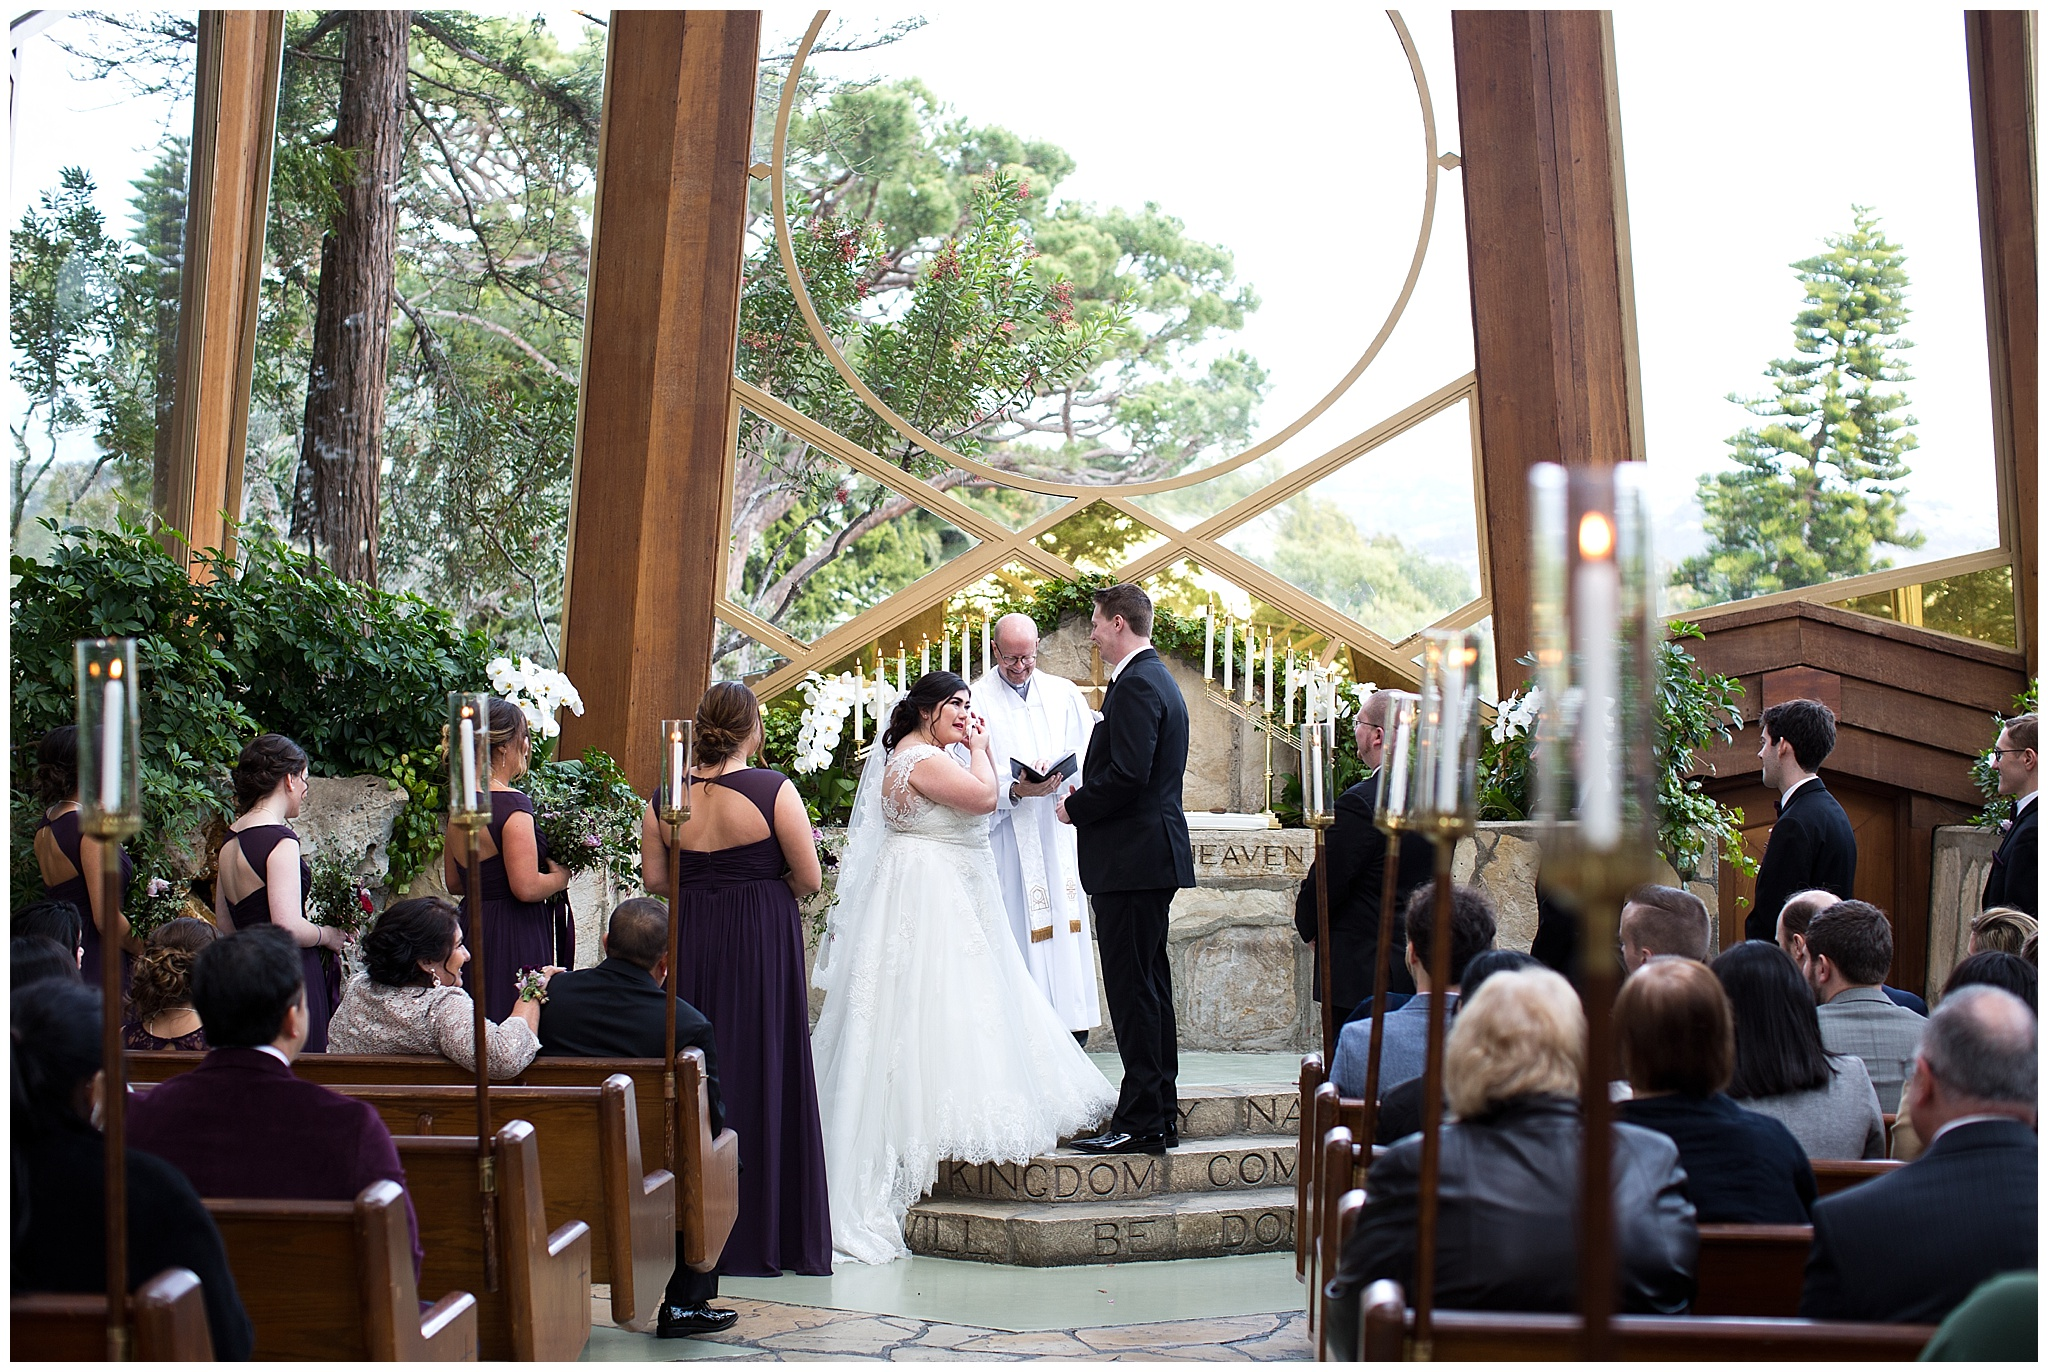 Carol_and_Grant_Wedding_3-3-18-8057.jpg